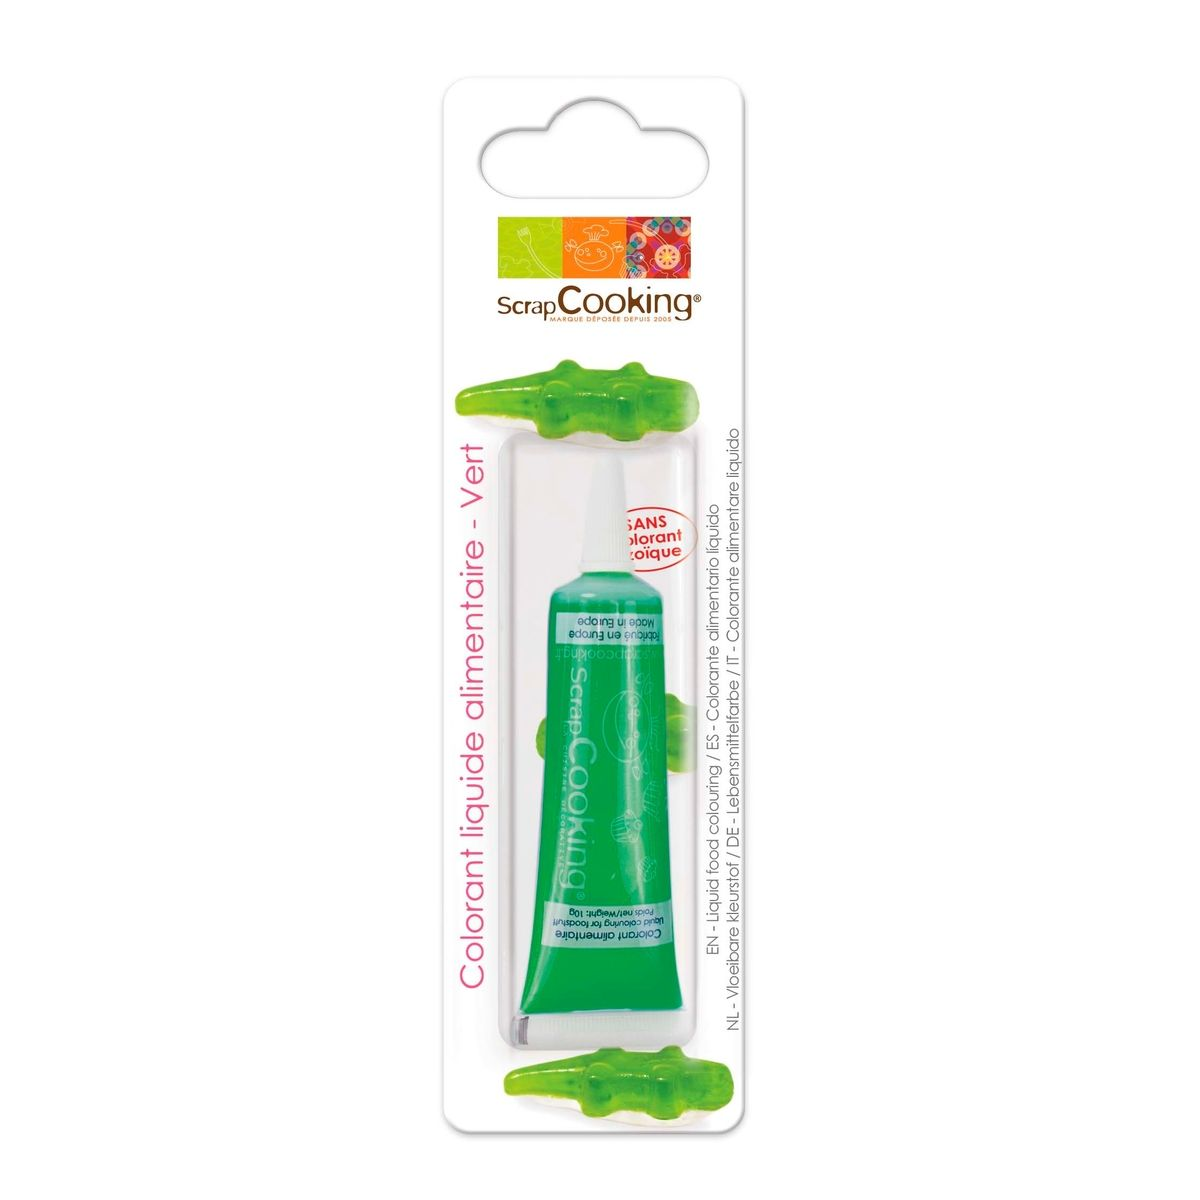 Colorant alimentaire liquide non azoïque vert 10 gr - Scrapcooking